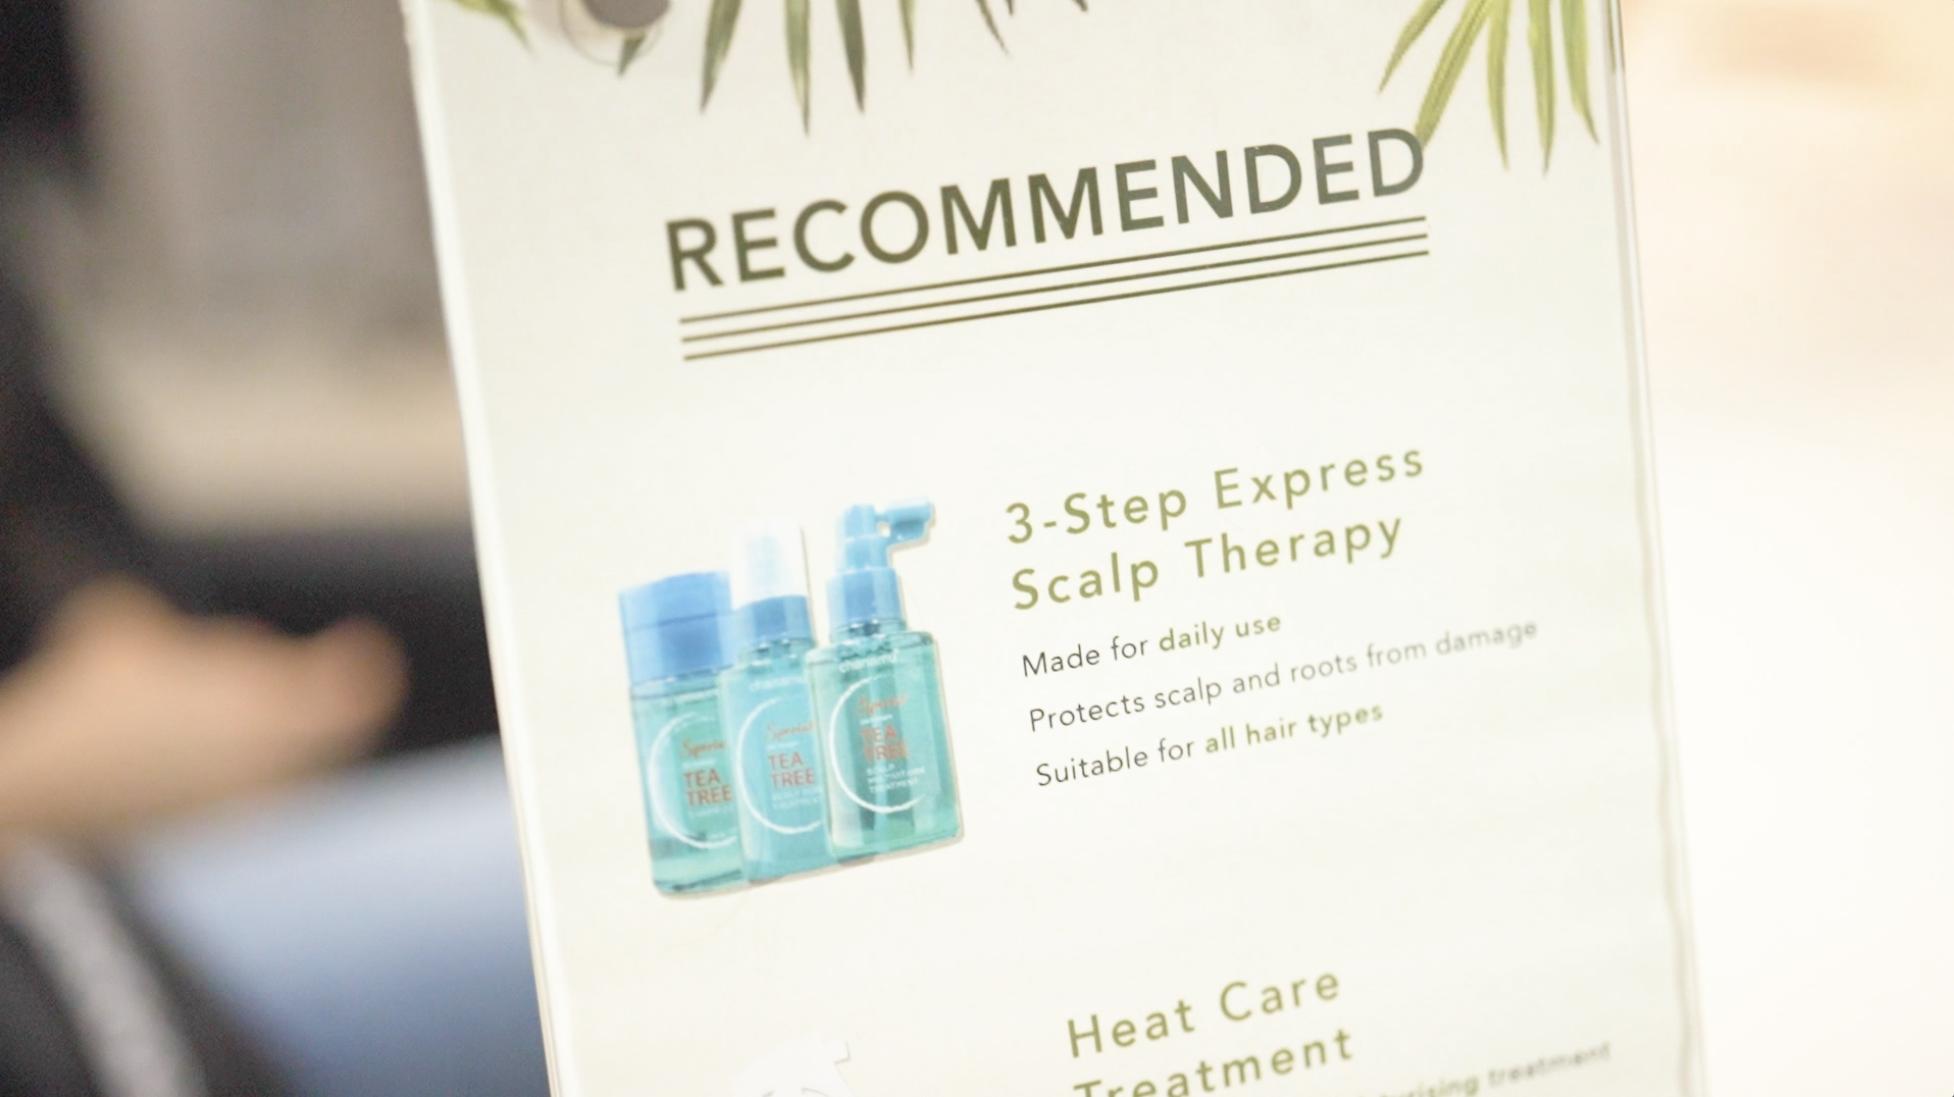 Floral print design for Salon treatment recommendations at DuSol Beauty Novena Singapore